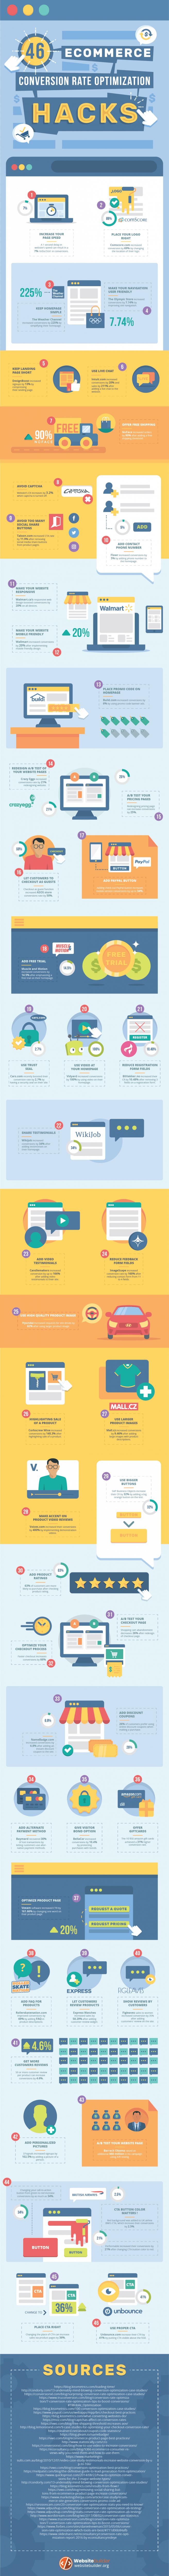 46 optimization hacks infographic